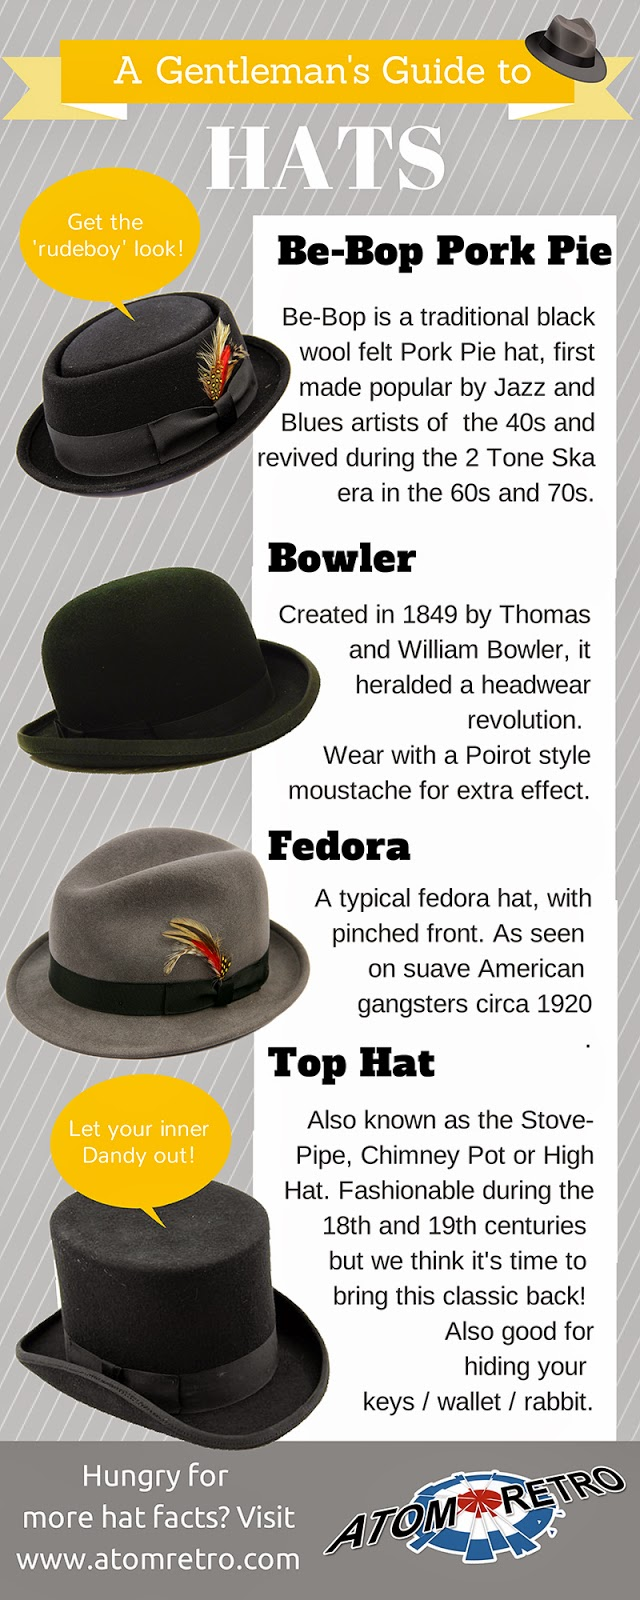 Atom Retro's Gentleman's Guide To Hats (Infographic)